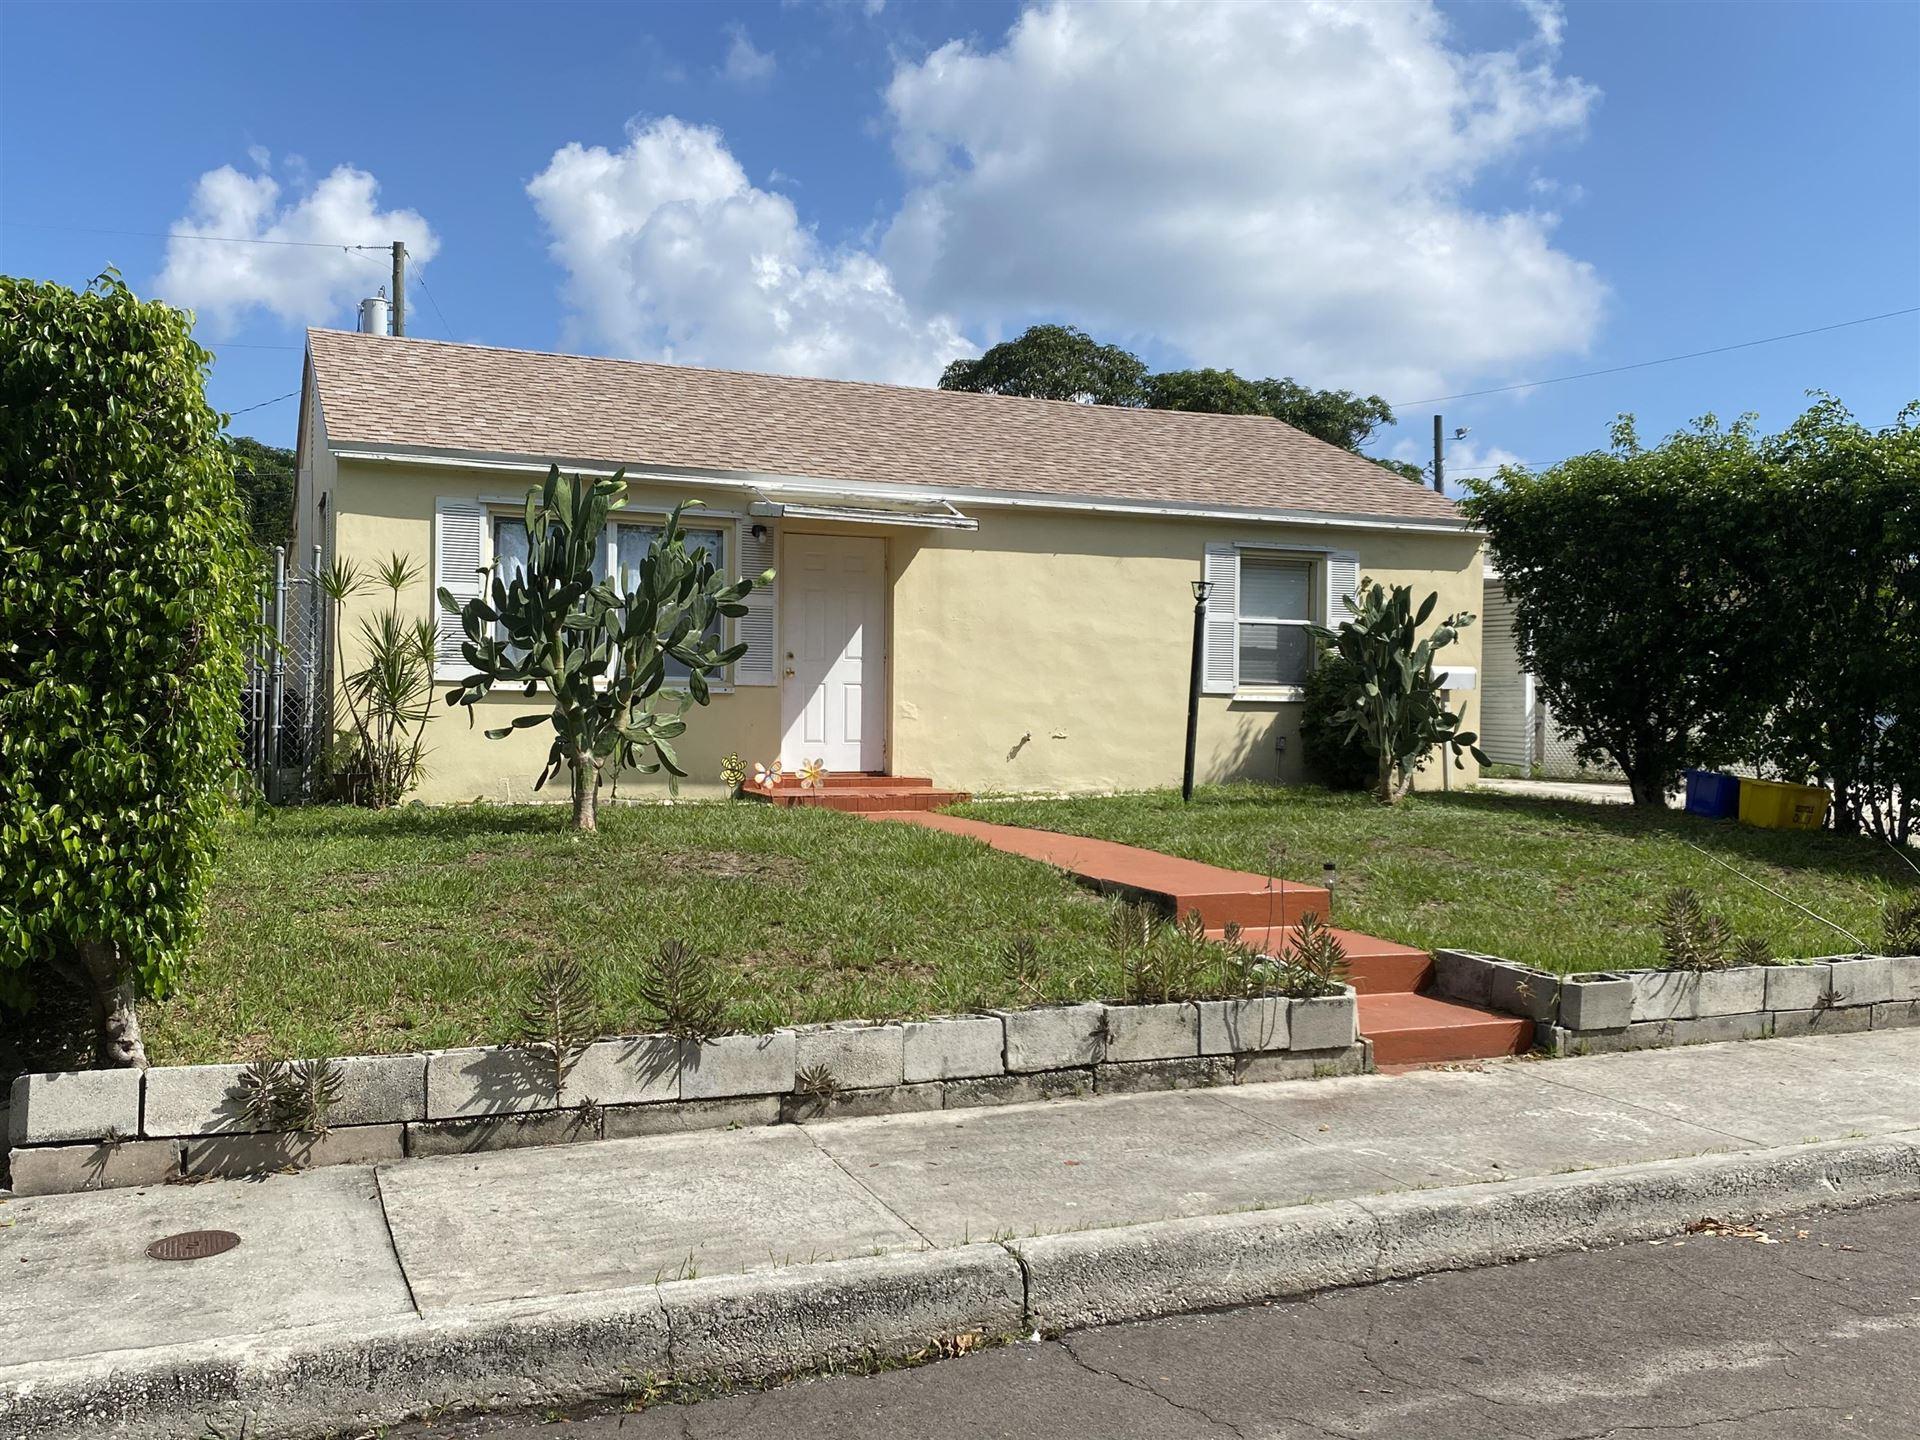 417 Summa Street, West Palm Beach, FL 33405 - MLS#: RX-10702509